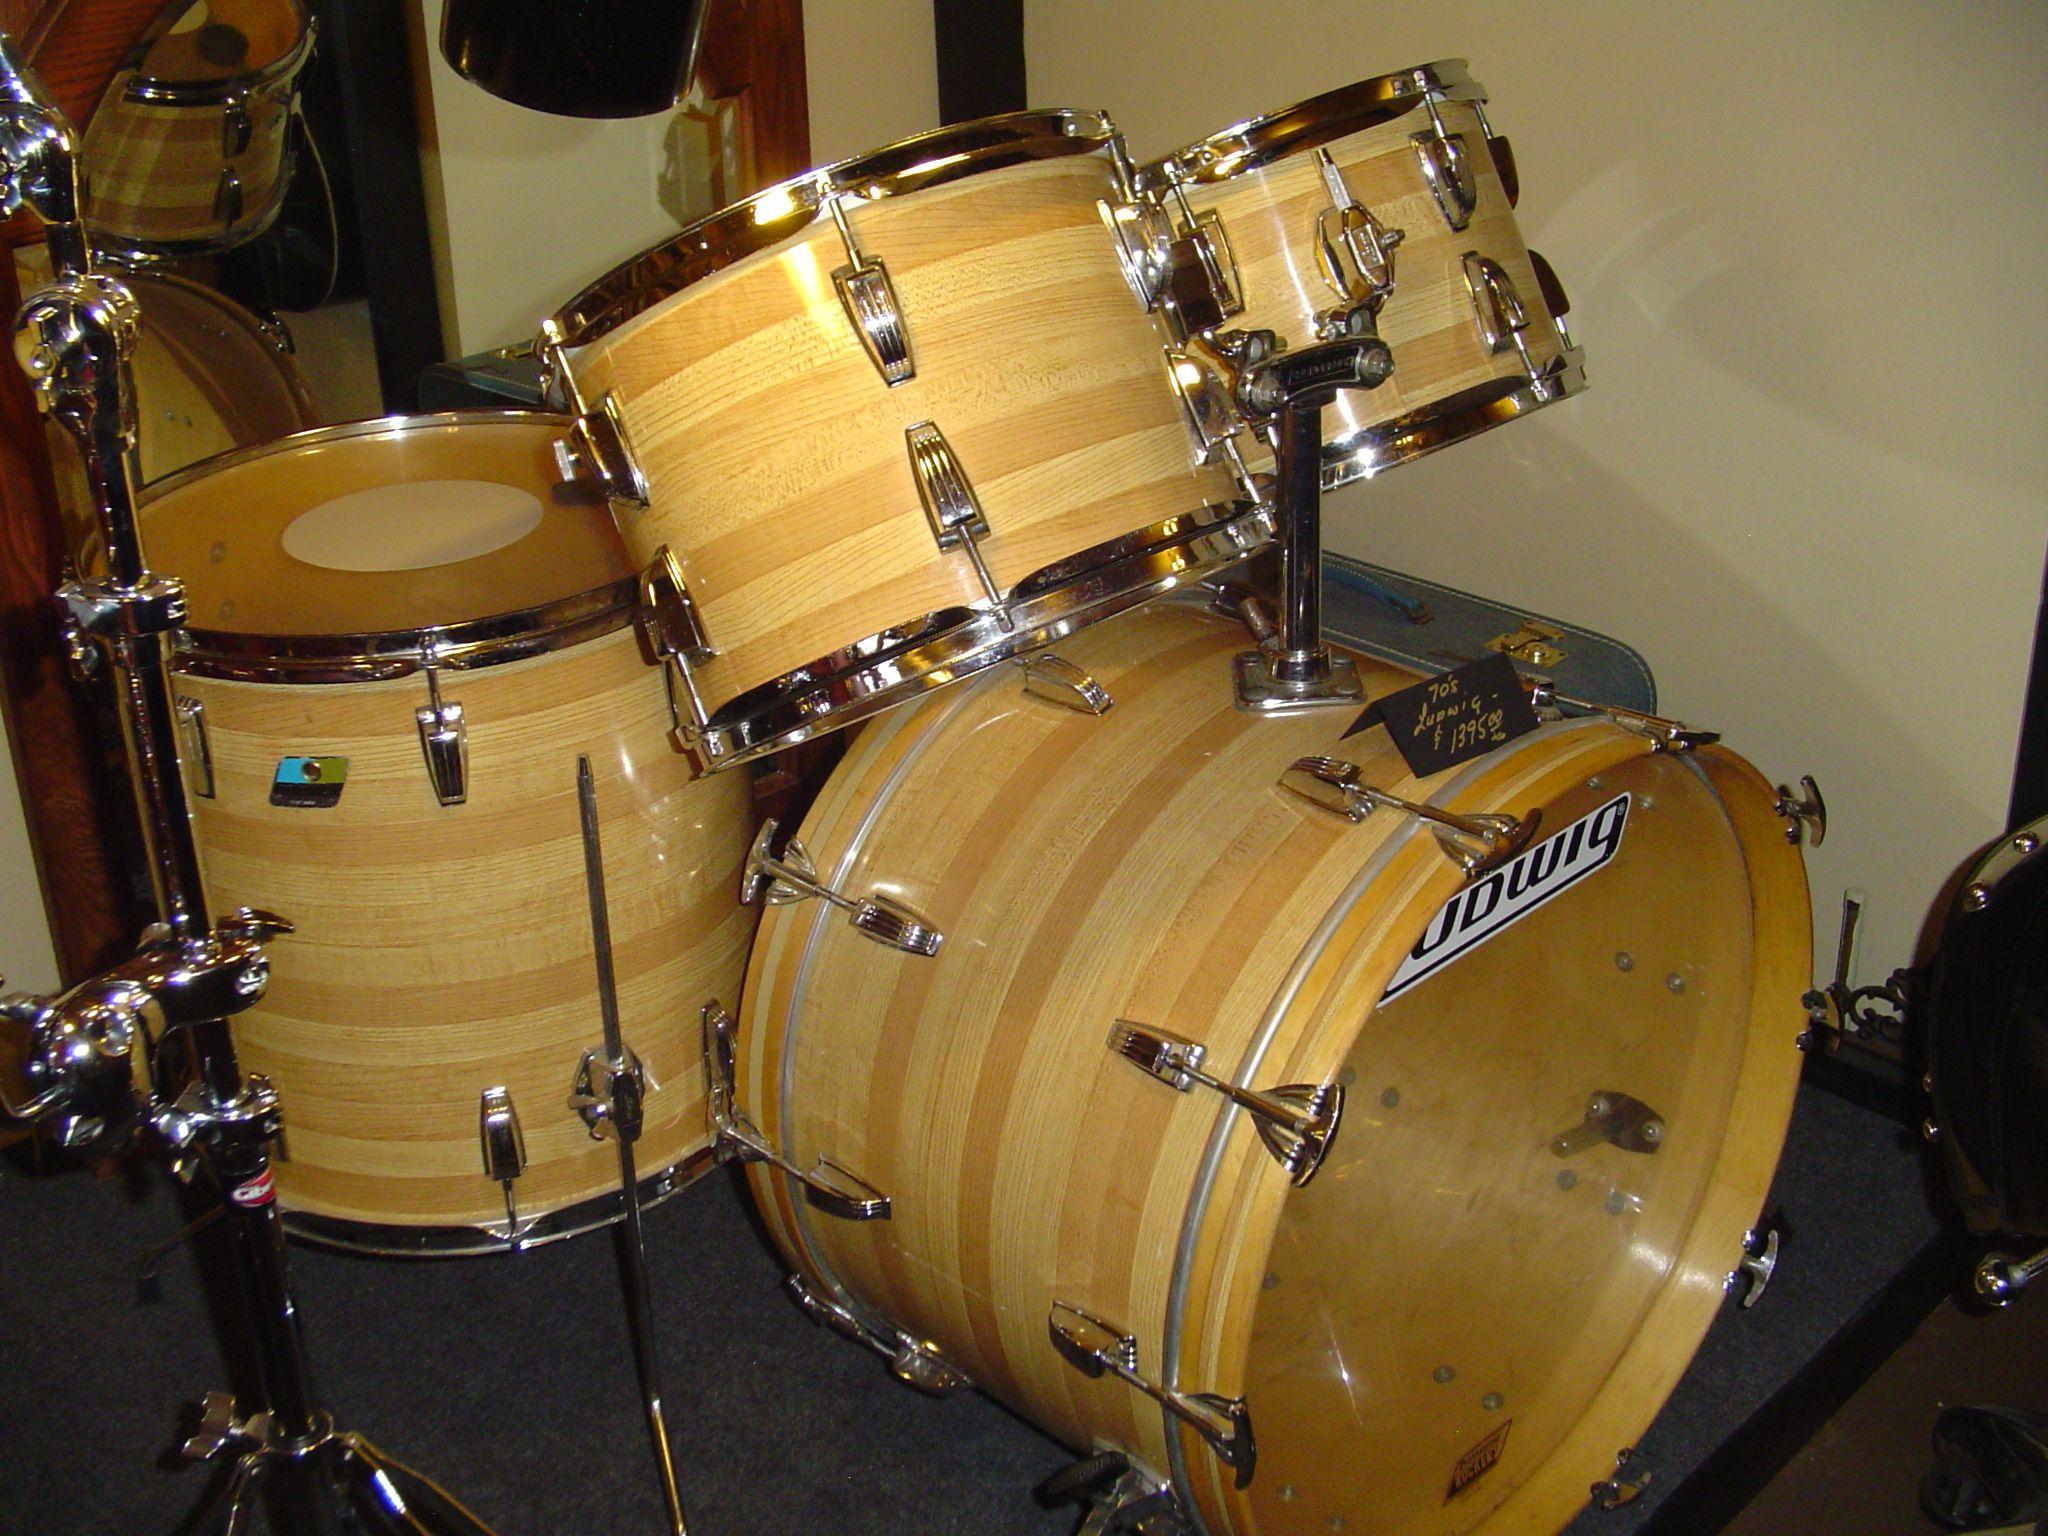 Ugliest Drum Set Ever Made | Drums | Pinterest | Butcher blocks ...